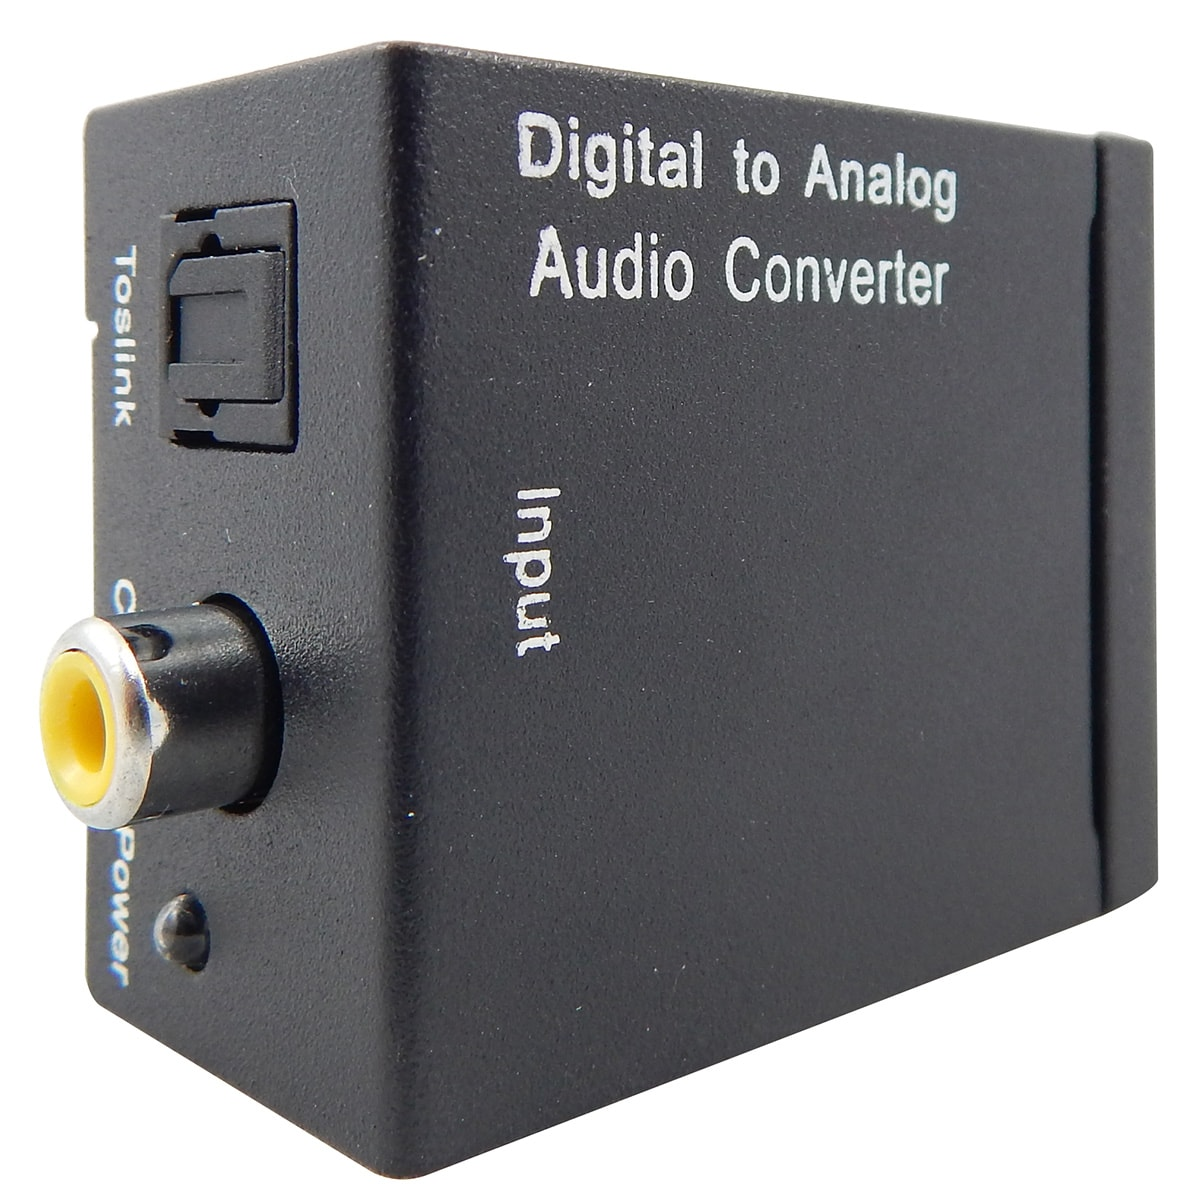 Kit Conversor Audio Digital p/ RCA + Cabo Óptico Toslink 1,5 metros